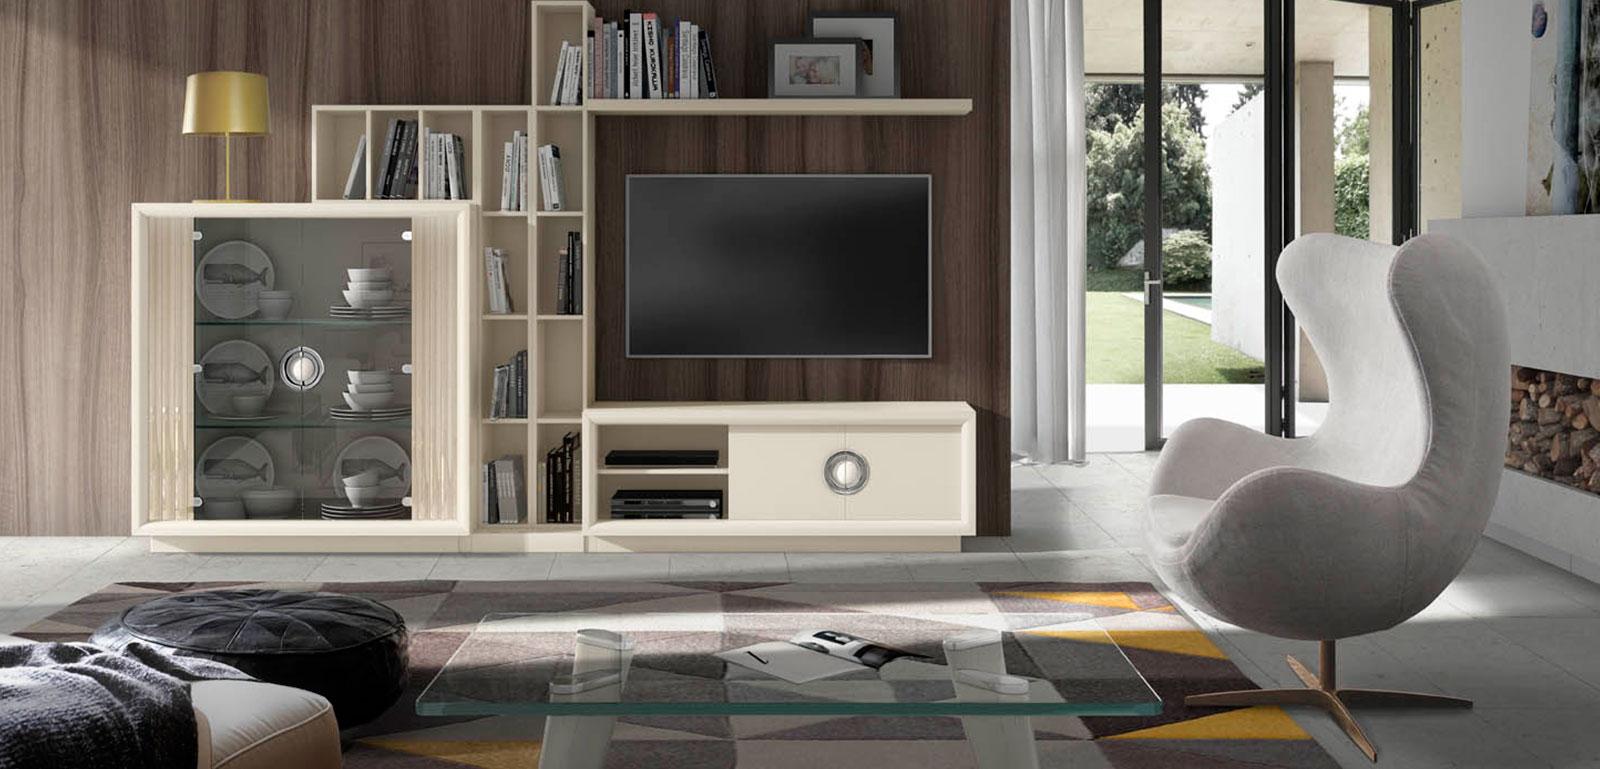 Monrabal chirivella fabrica de muebles de alta calidad y for Fabrica de muebles de diseno